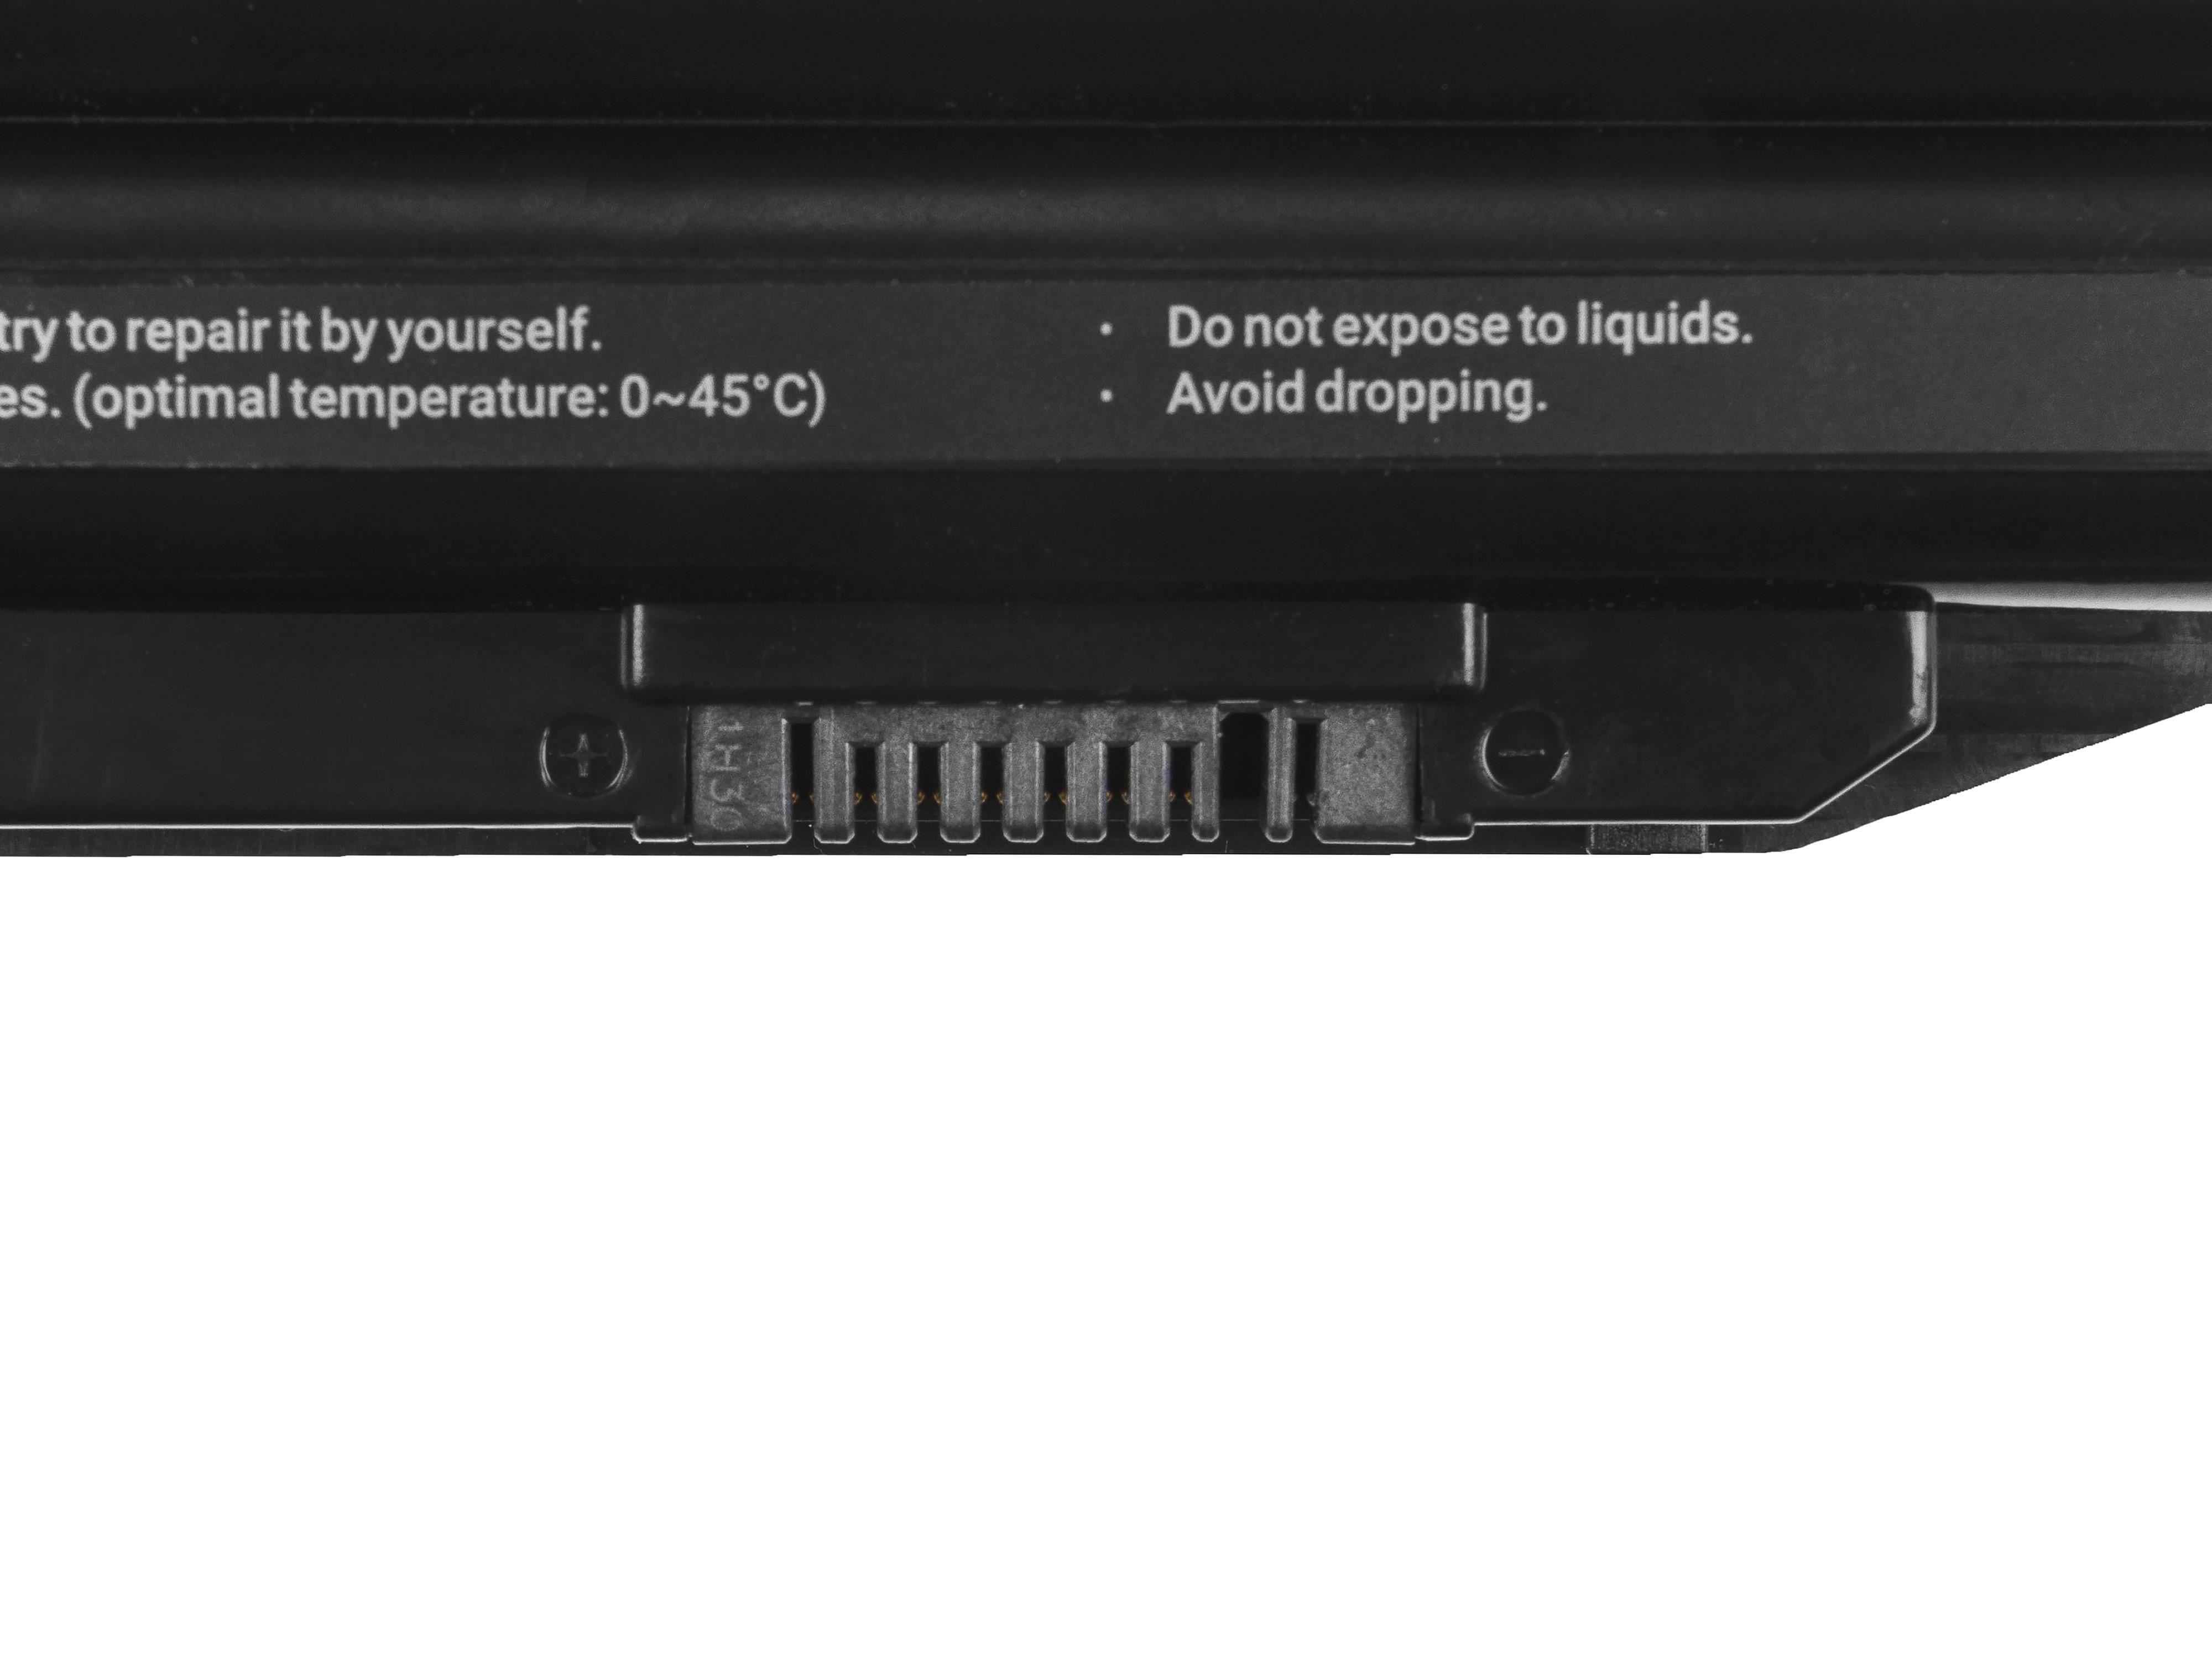 Green Cell FS30 Baterie Fujitsu LifeBook A514 A544 A555 AH544 AH564 E547 E554 E733 E734 E743 E744 E746 E753 E754 S904 2000mAh Li-ion - neoriginální